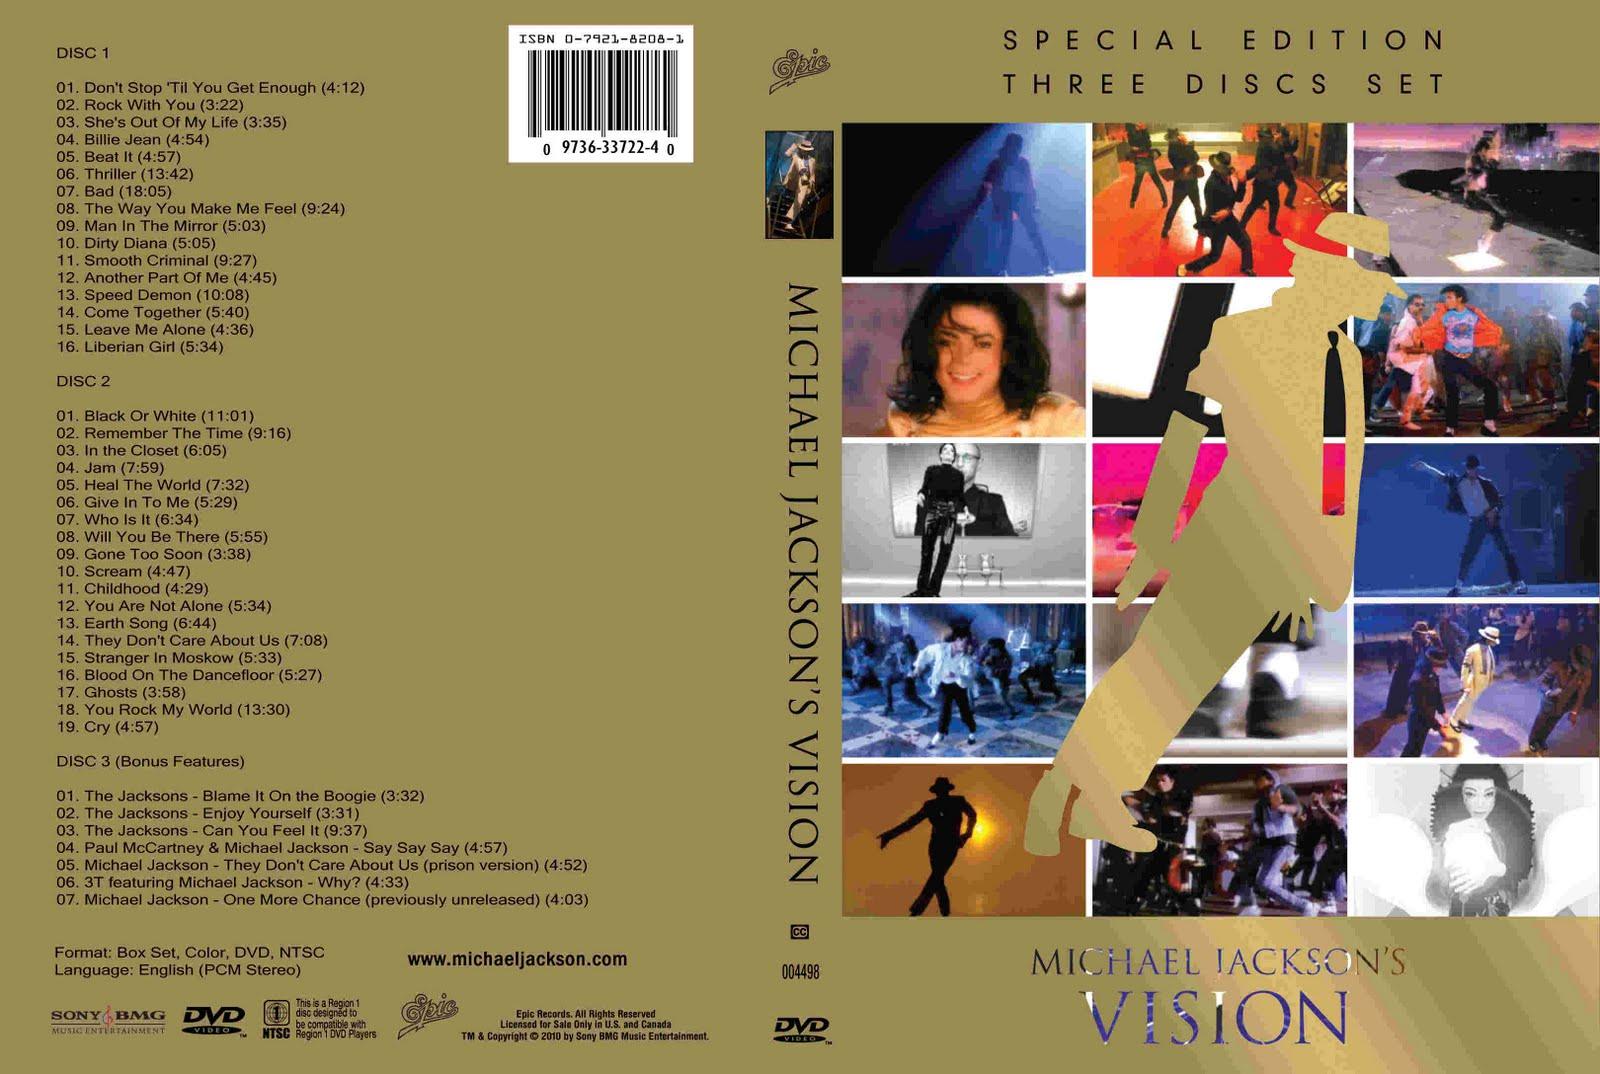 http://4.bp.blogspot.com/-CSxT9zQ3ILE/T-SX05SEQuI/AAAAAAAAA8w/NB443fExwYw/s1600/Michael_Jackson_-_Vision.jpg